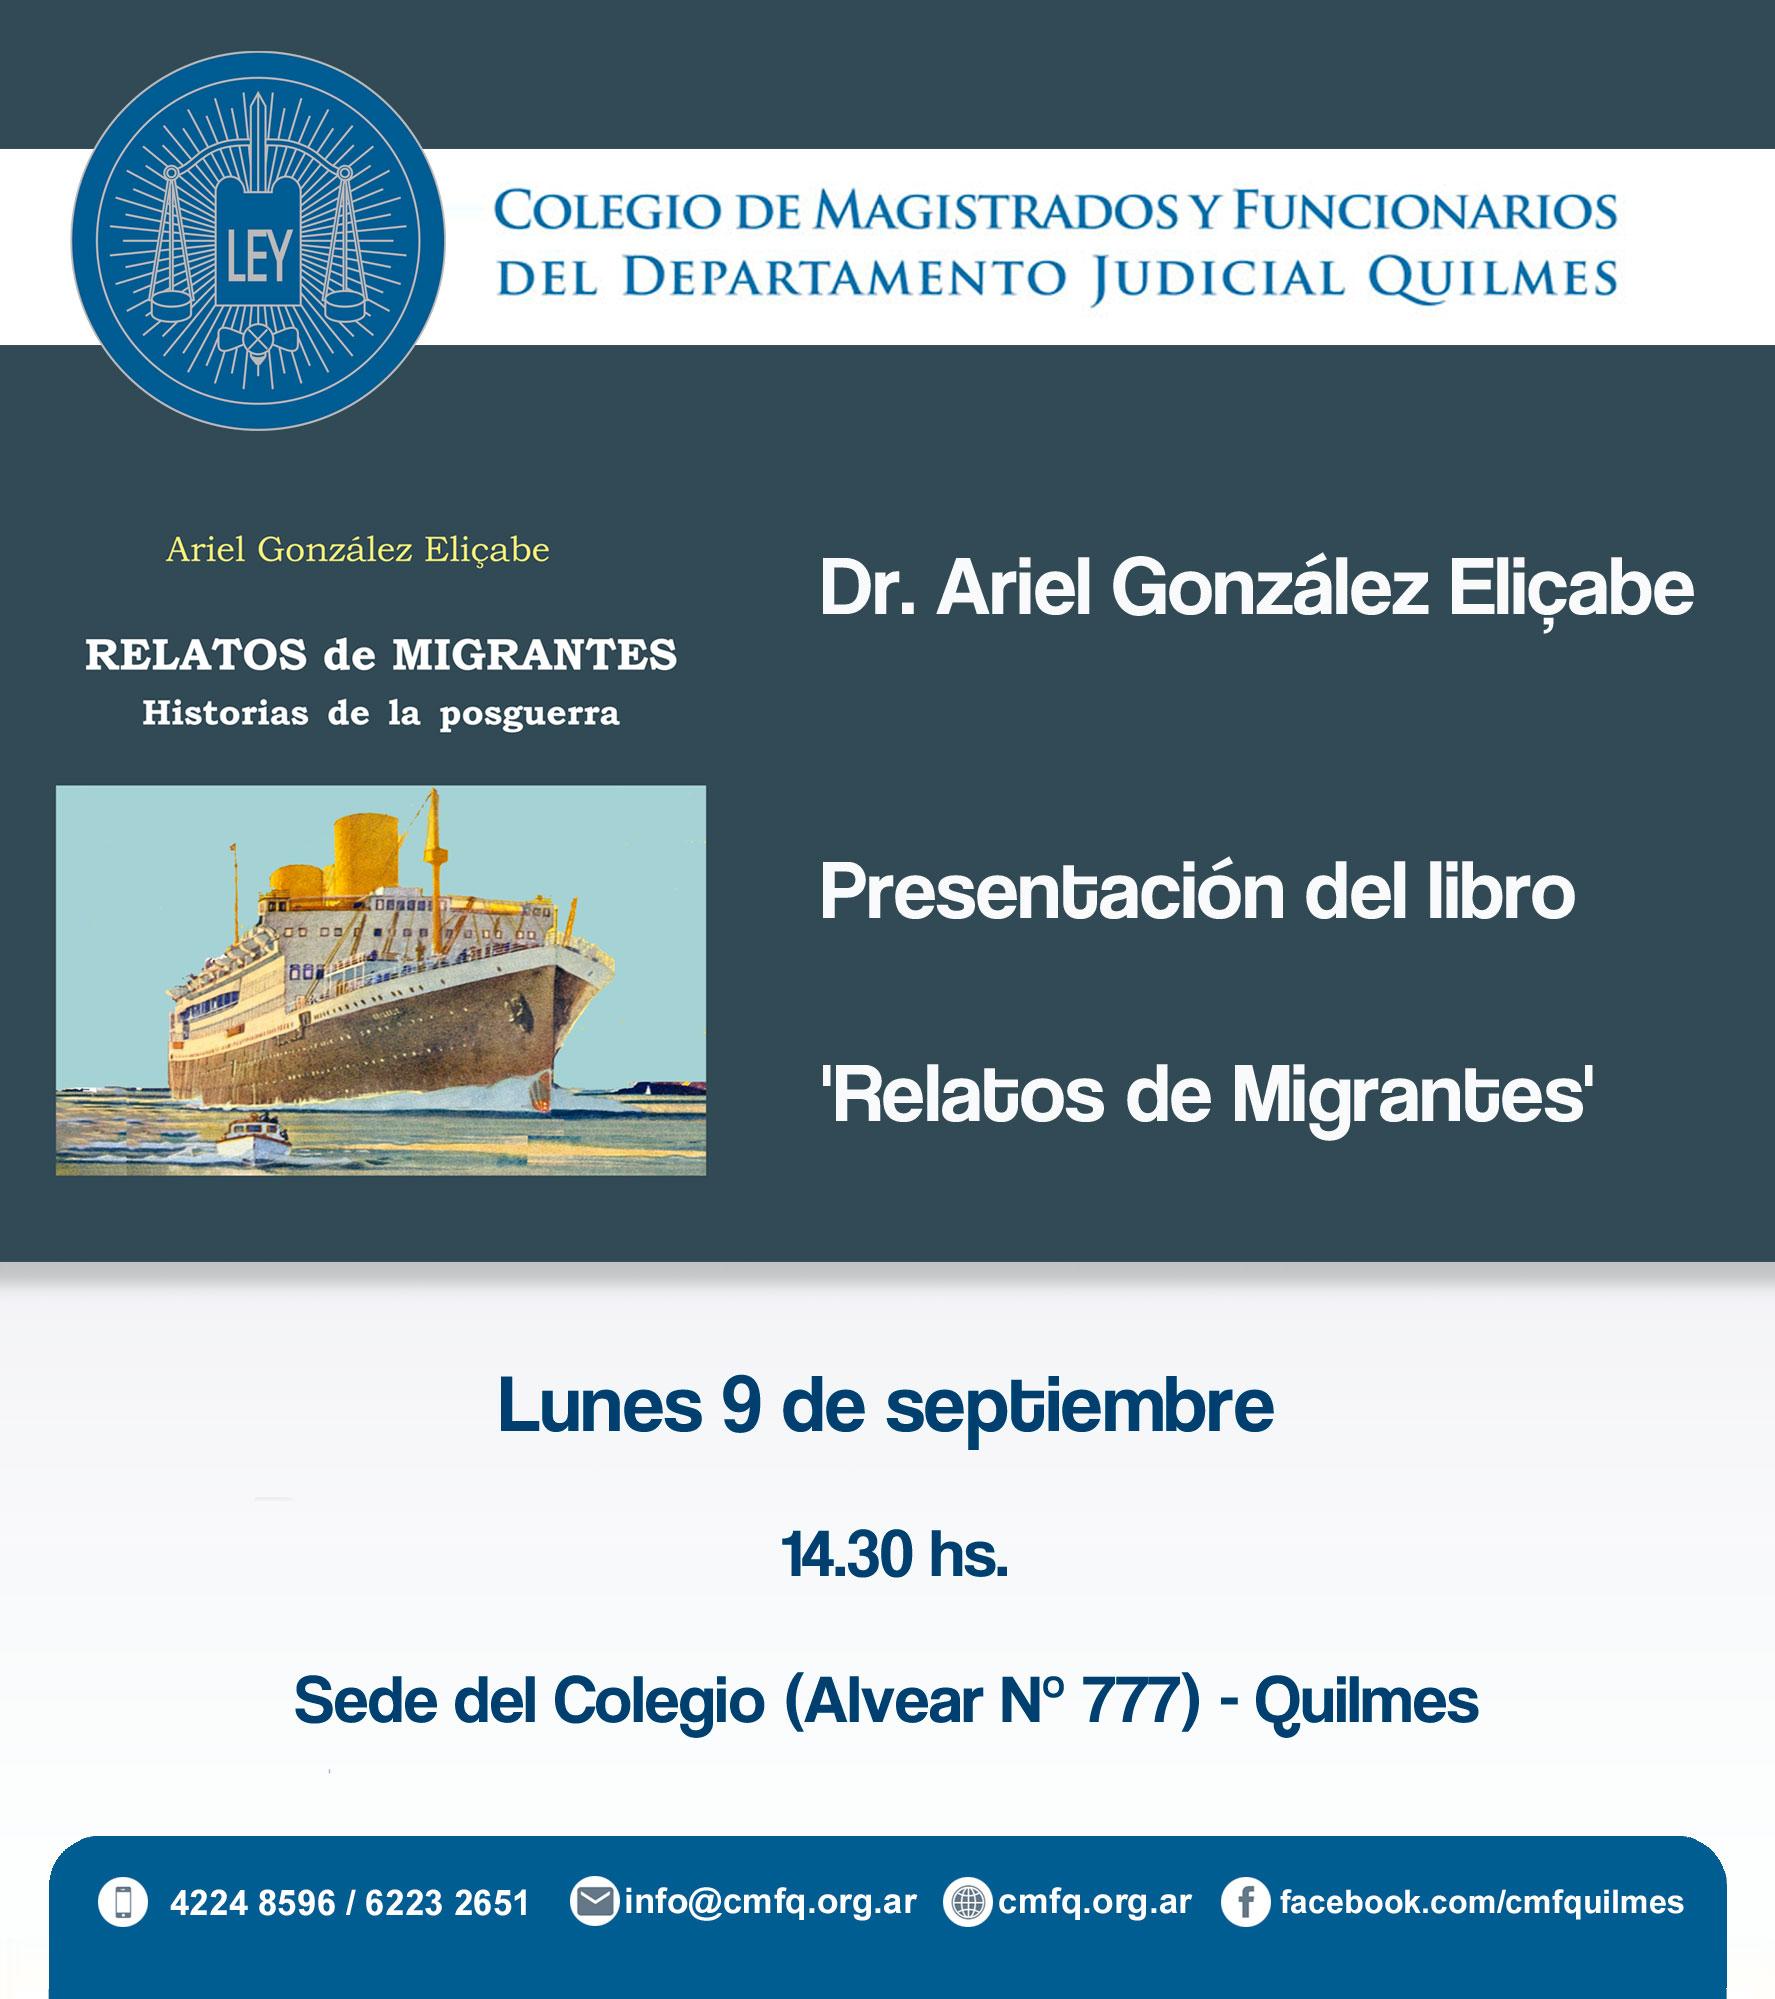 Dr. Ariel González Eliçabe